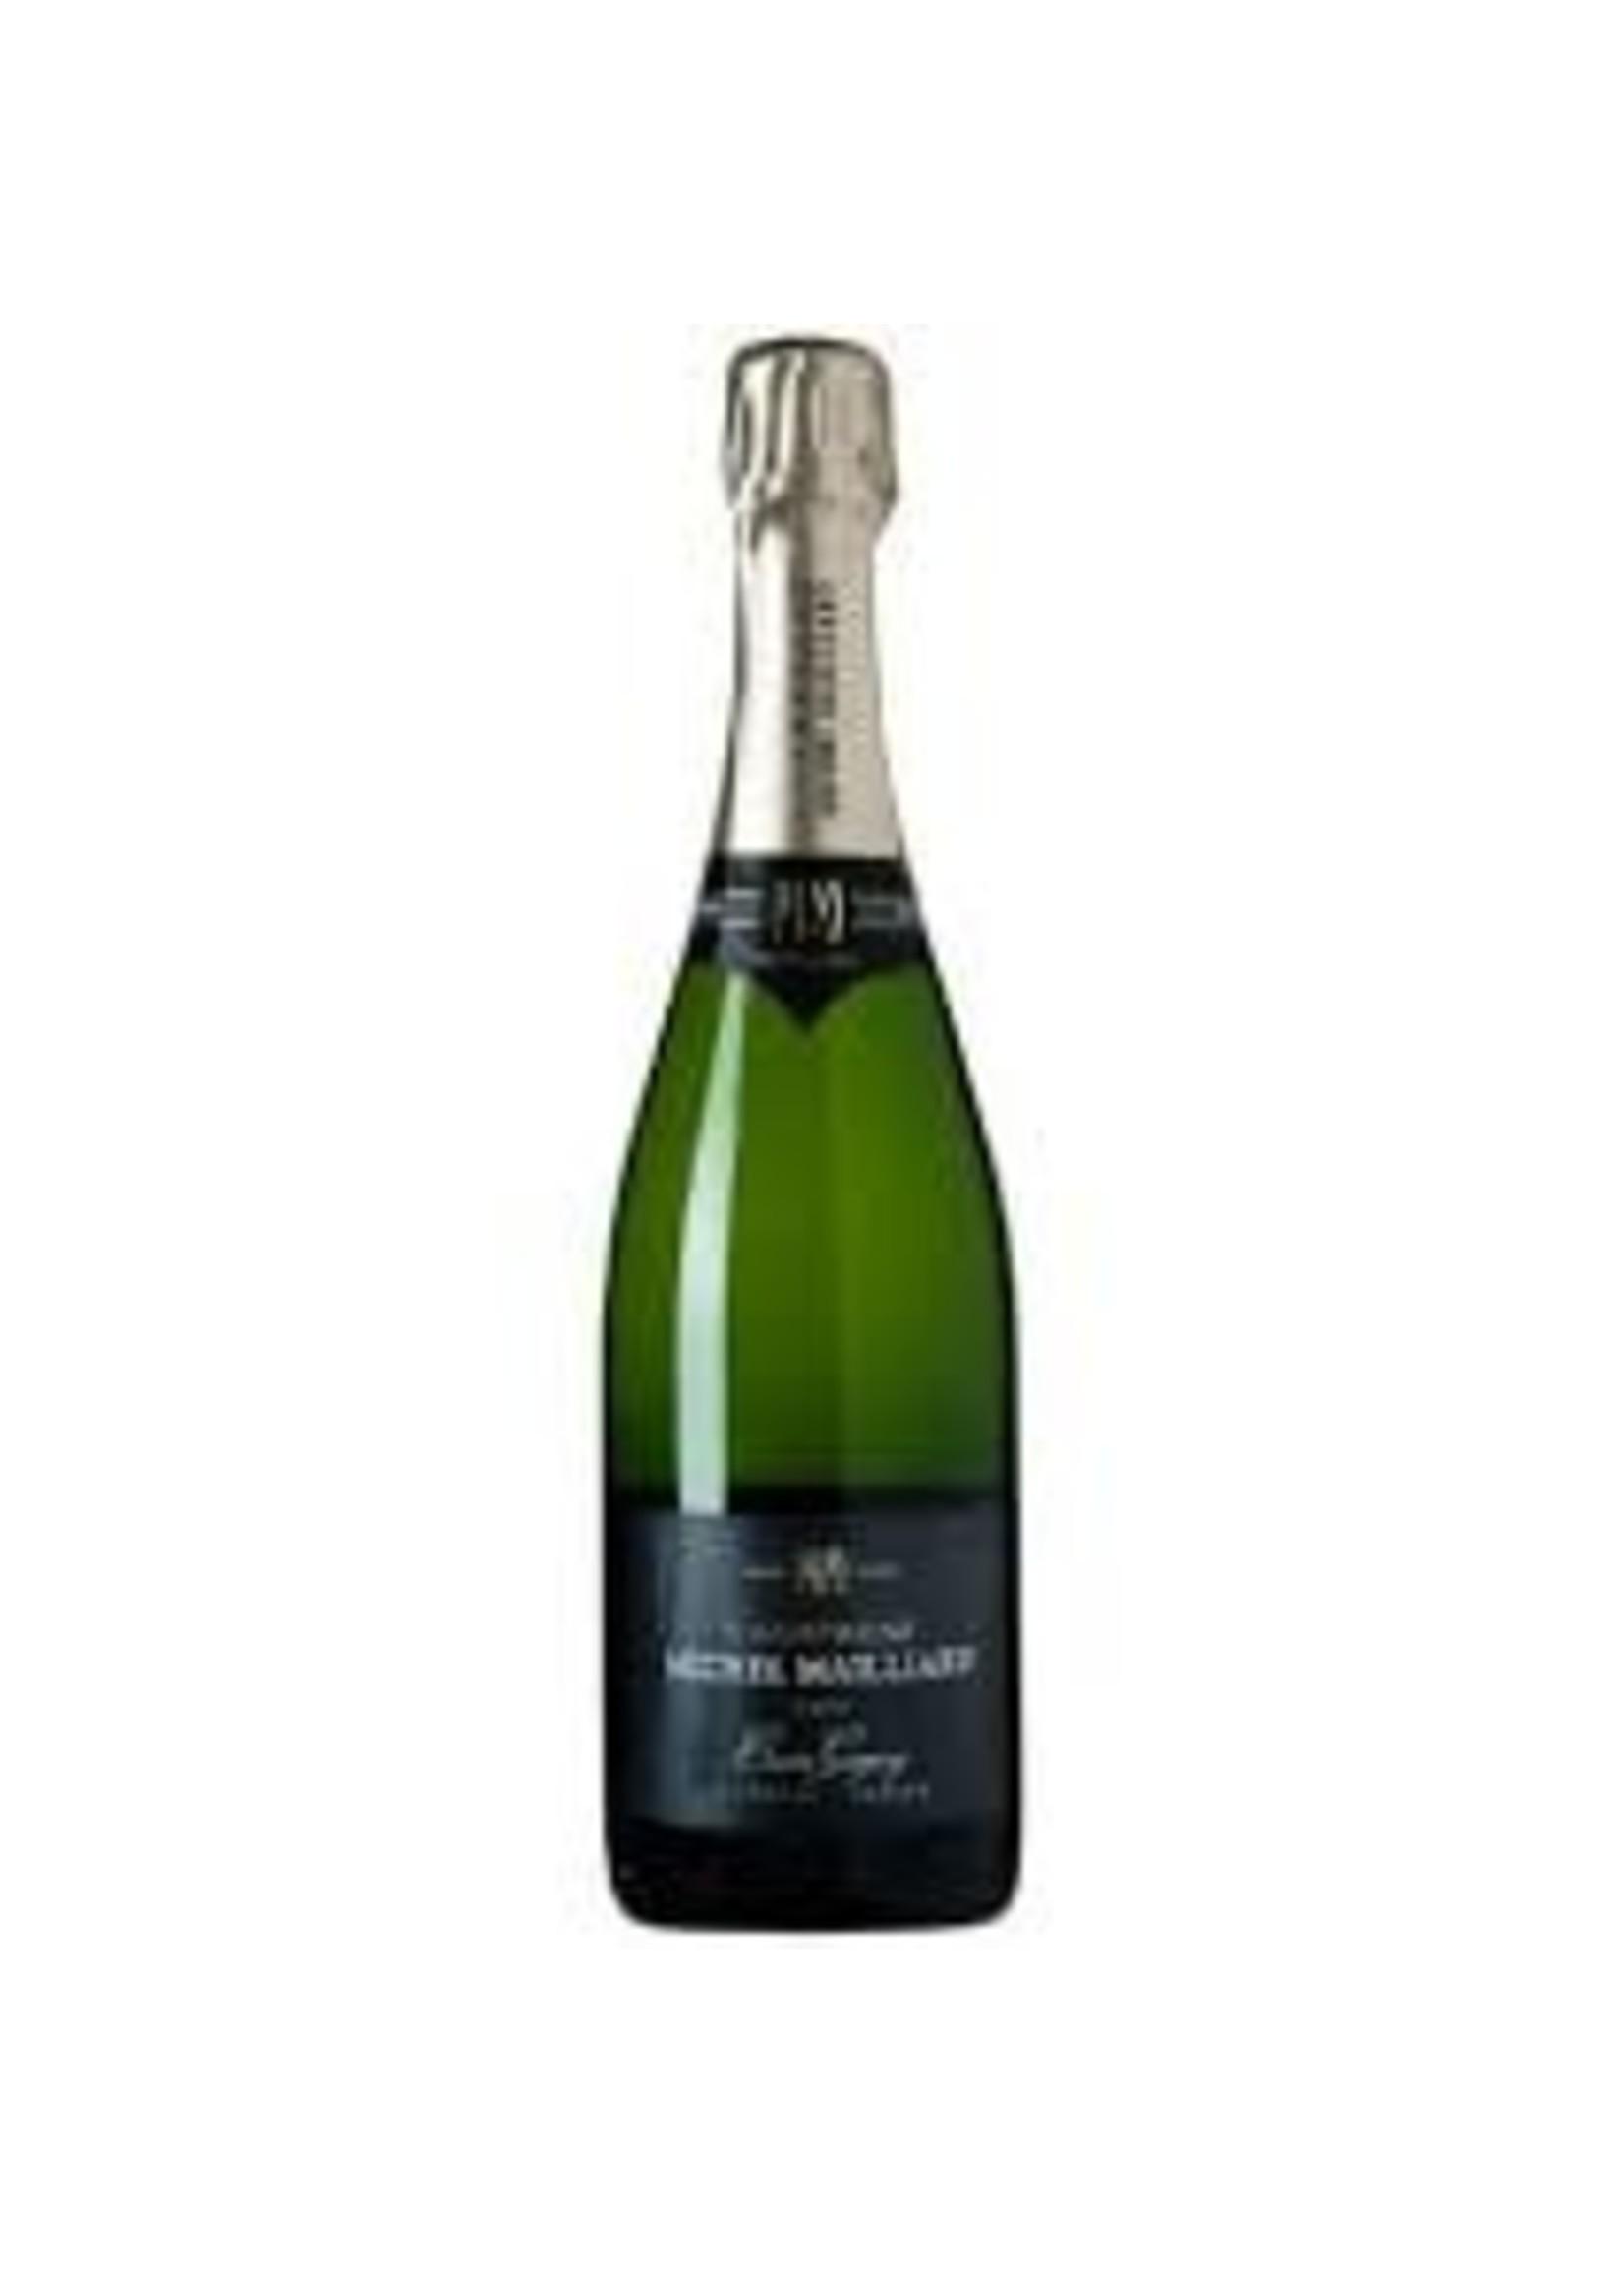 Michel Mailliard Champagne NV Cuvee Gregory Brut 750ml